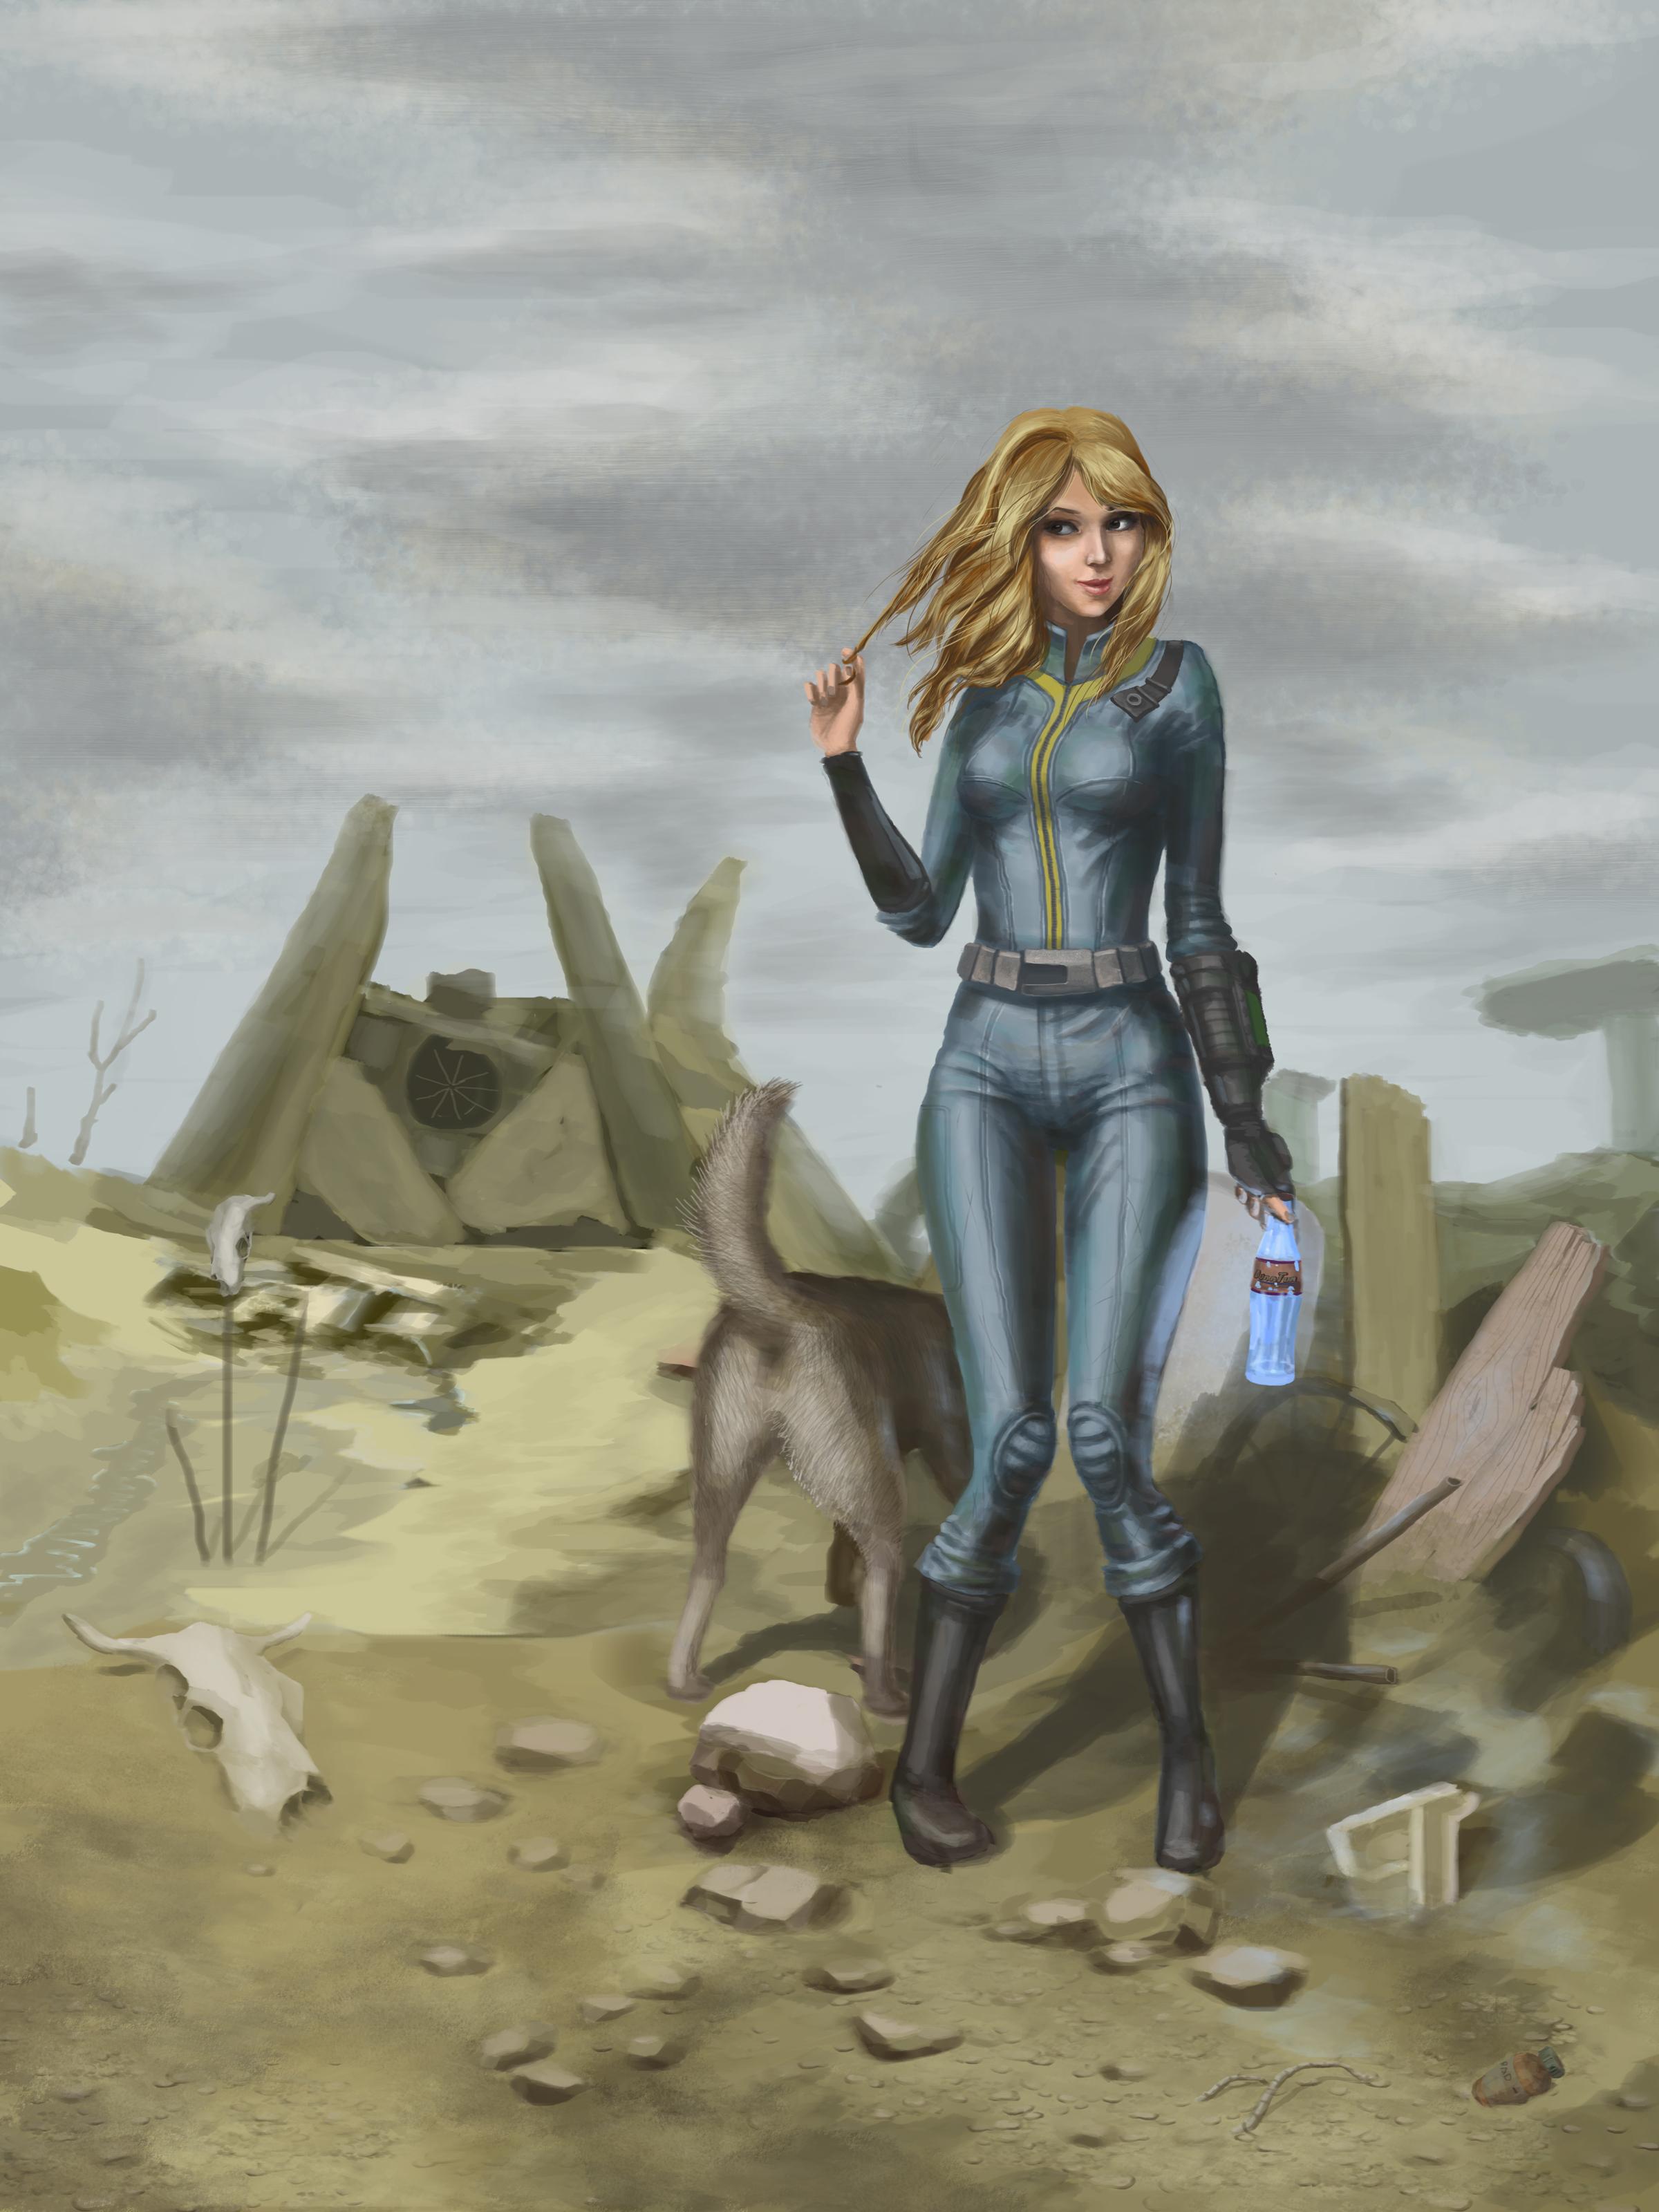 Vault Girl by Reiup on DeviantArt